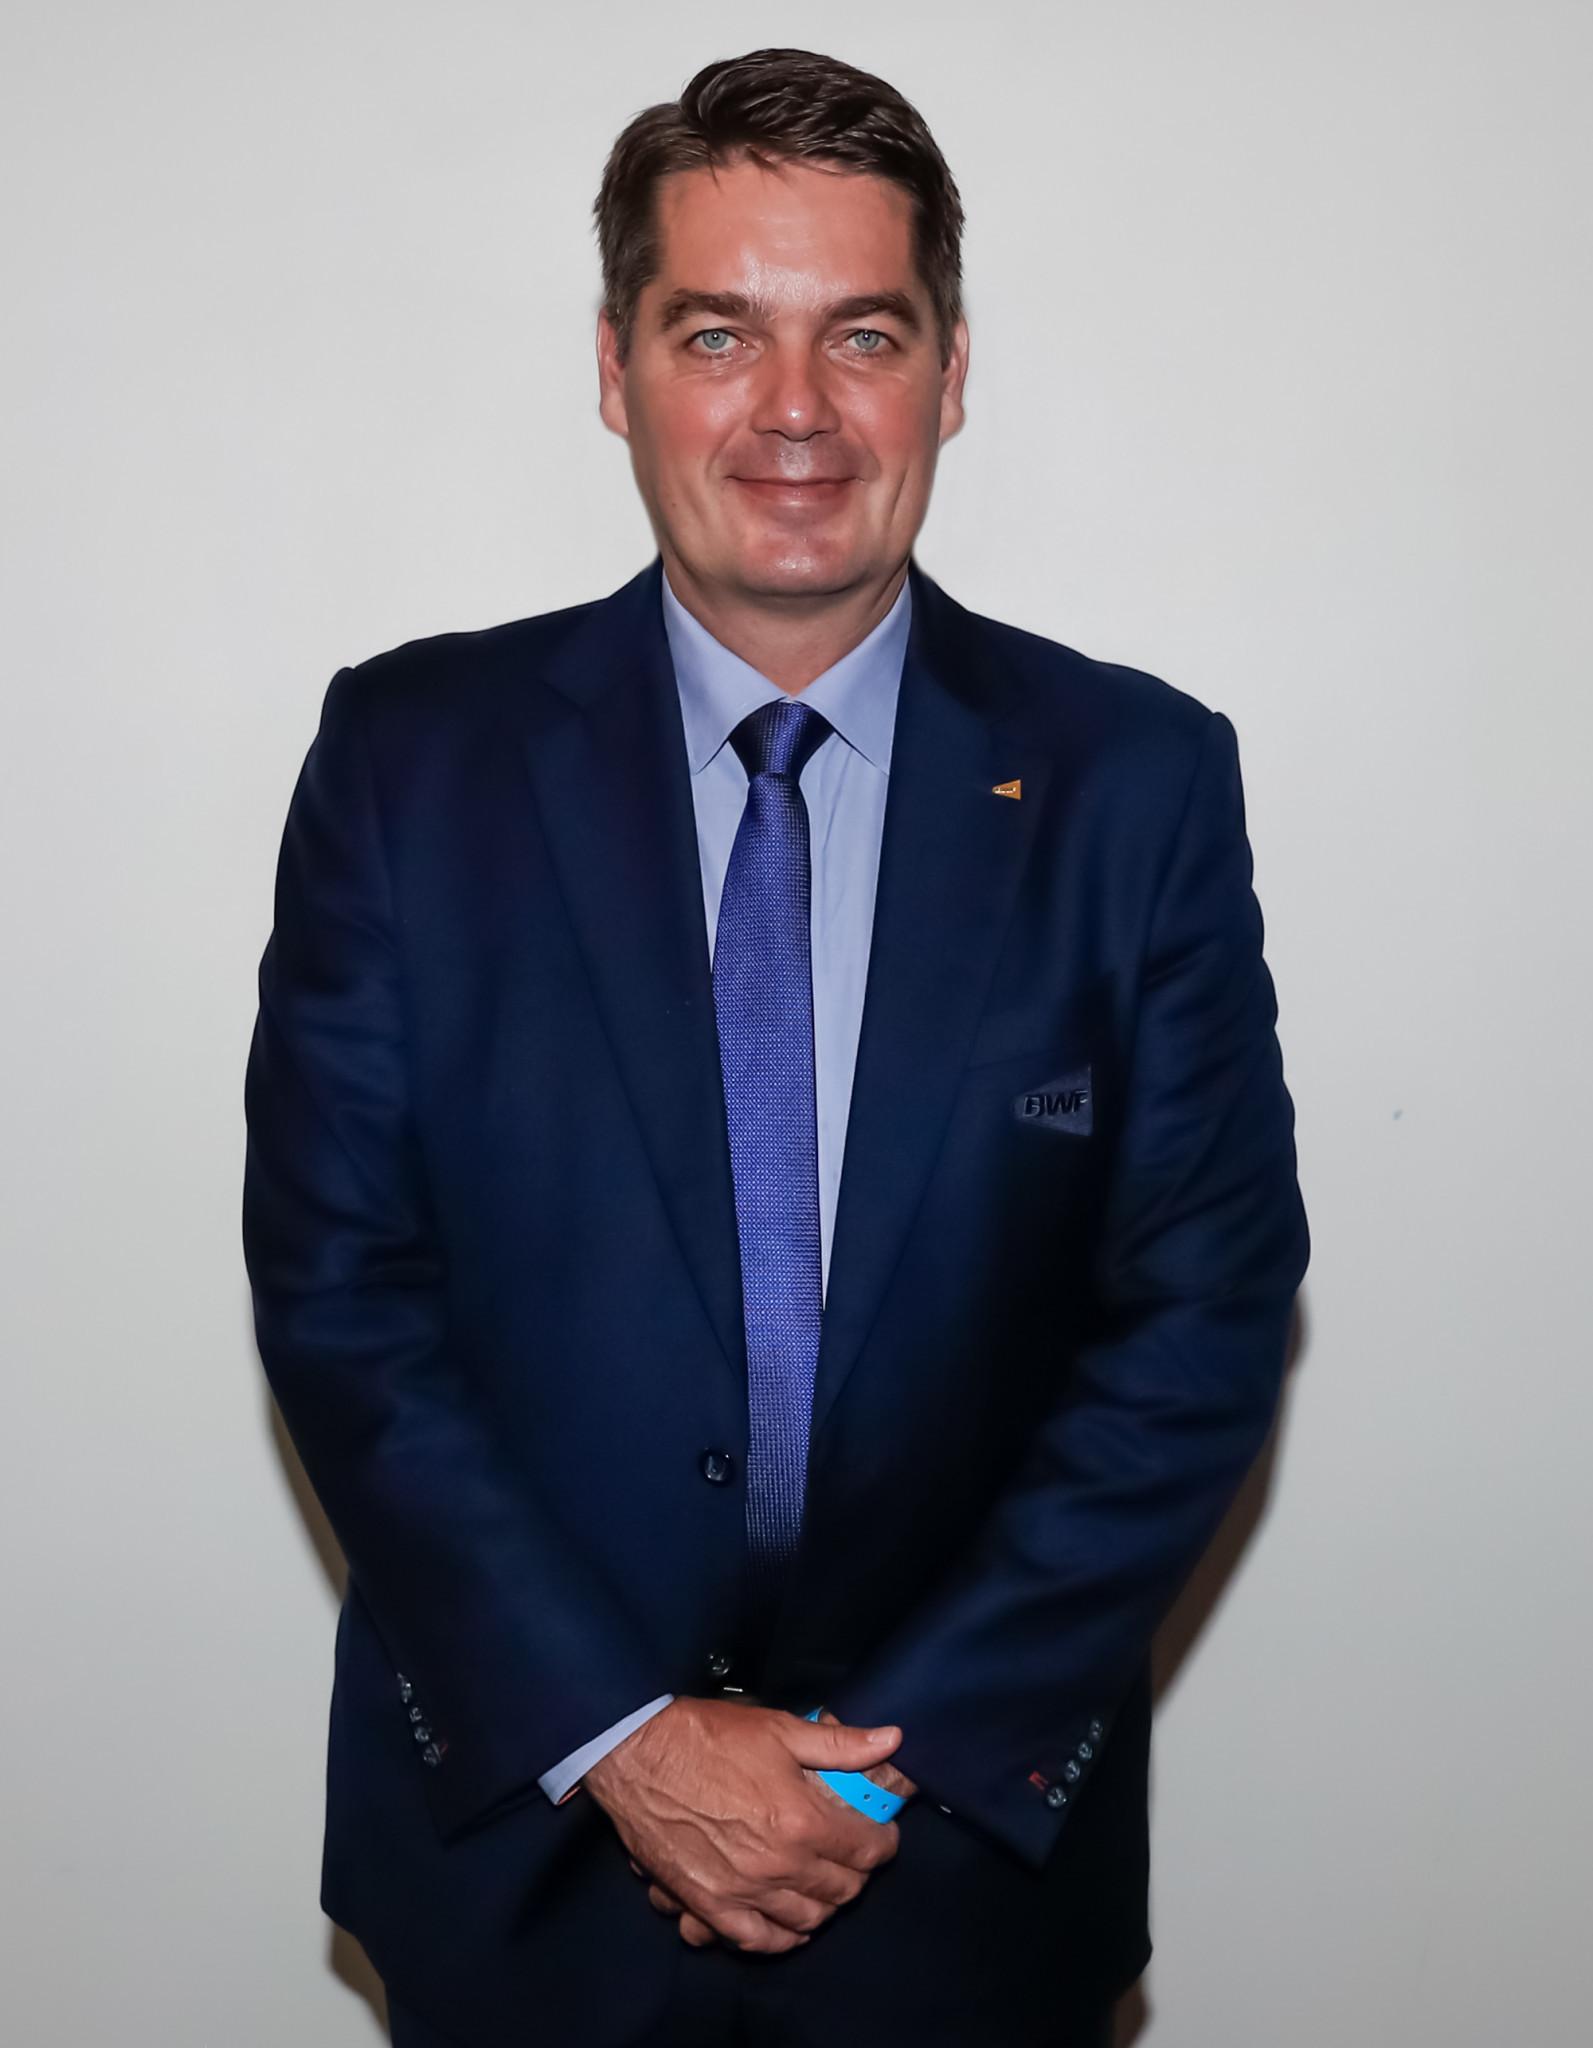 Poul-Erik Høyer: Tokyo 2020 an important breakthrough for the future of Para badminton